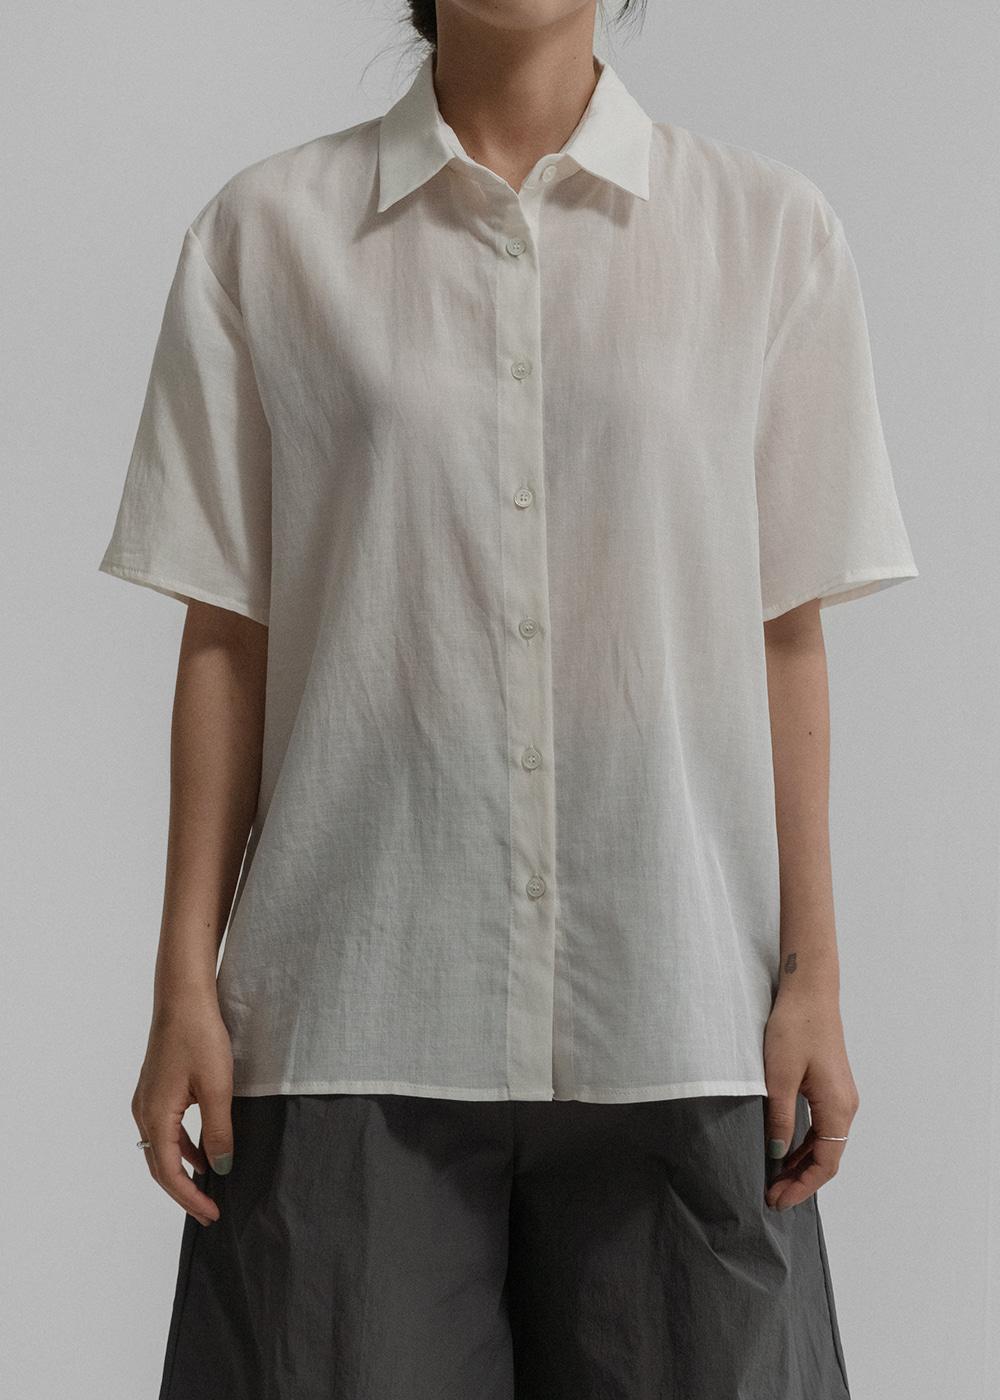 [NYUNYU WEAR] Short-sleeved shirt